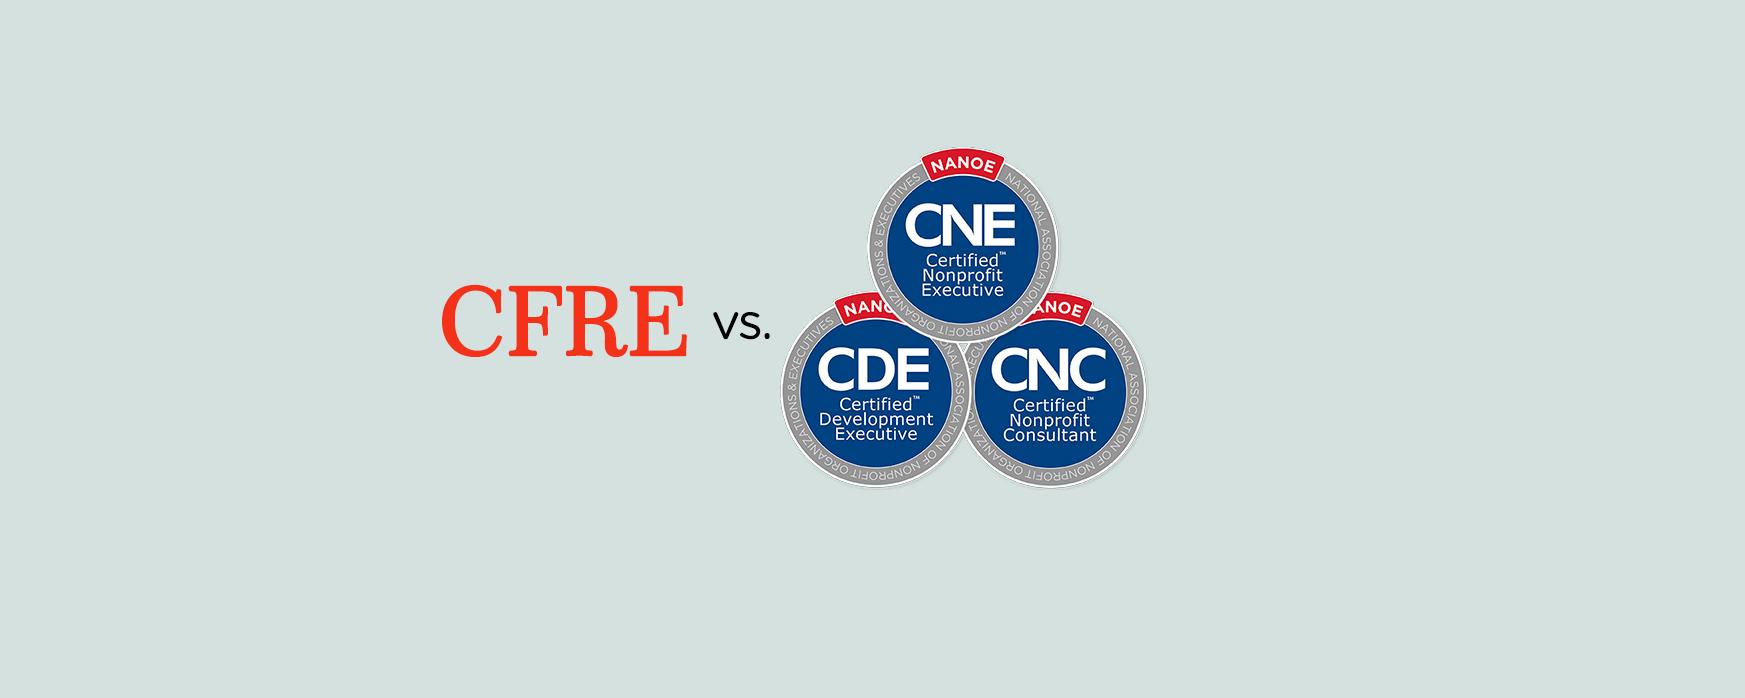 CFRE vs. CNC CDE CNE NANOE